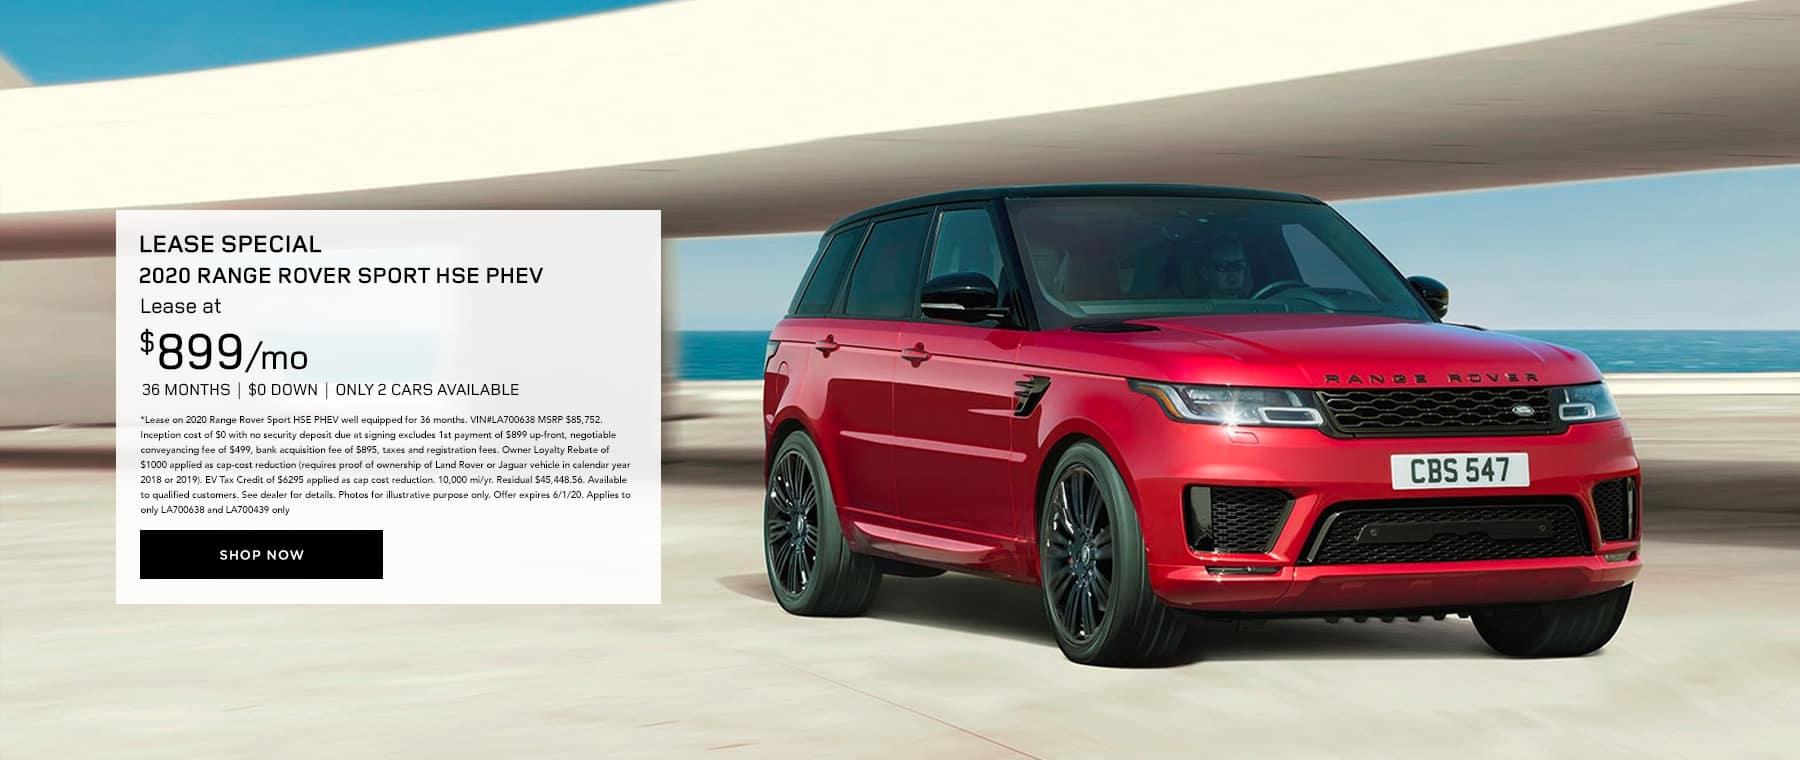 Range Rover Sport Lease